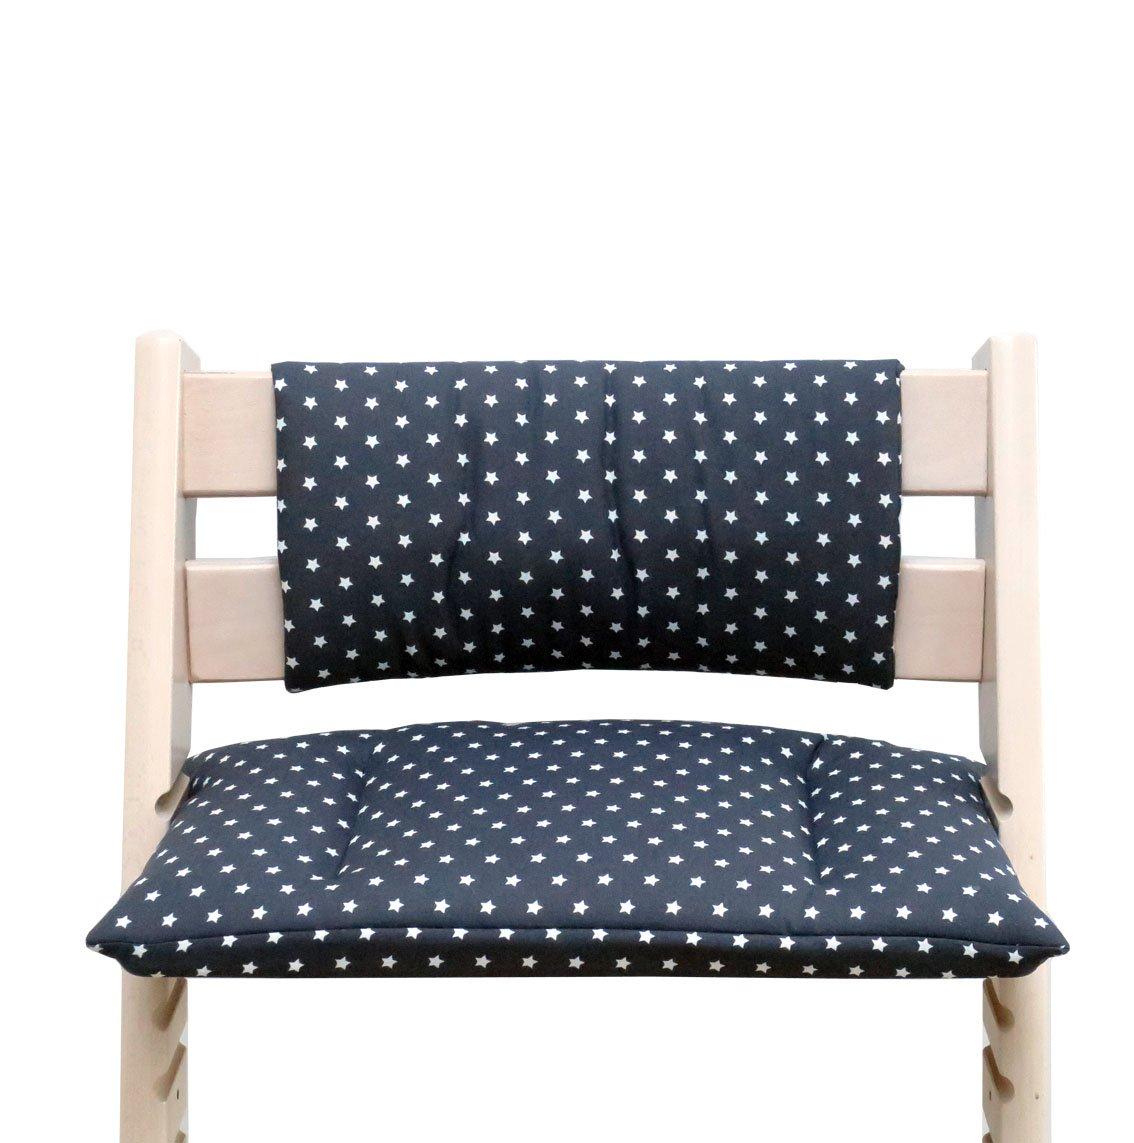 Amazon.com : Blausberg Baby - Cushion Set Junior for Tripp ...